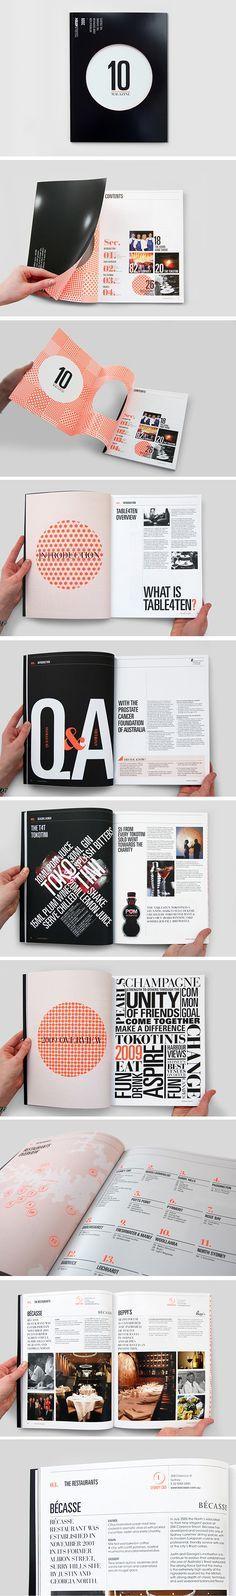 "Magazine  Logo art , pre made logos : <a href=""http://www.etsy.com/shop/BannerSetDesigns?ref=pr_shop_more"" rel=""nofollow"" target=""_blank"">www.etsy.com/...</a>"